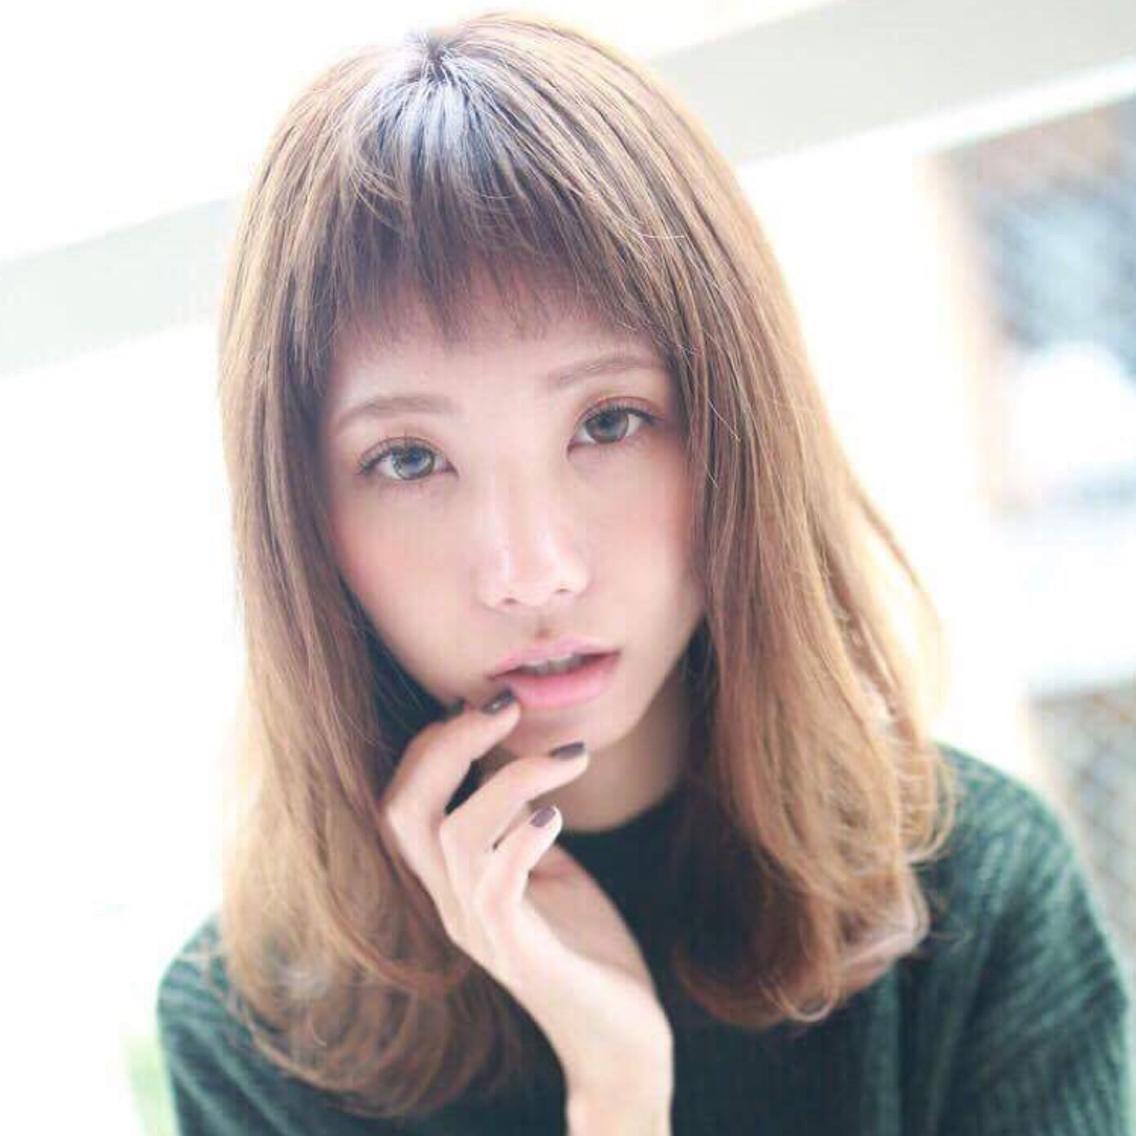 Aguhairatelier仙台中央店byalice所属・Aguhair atelier仙台の掲載